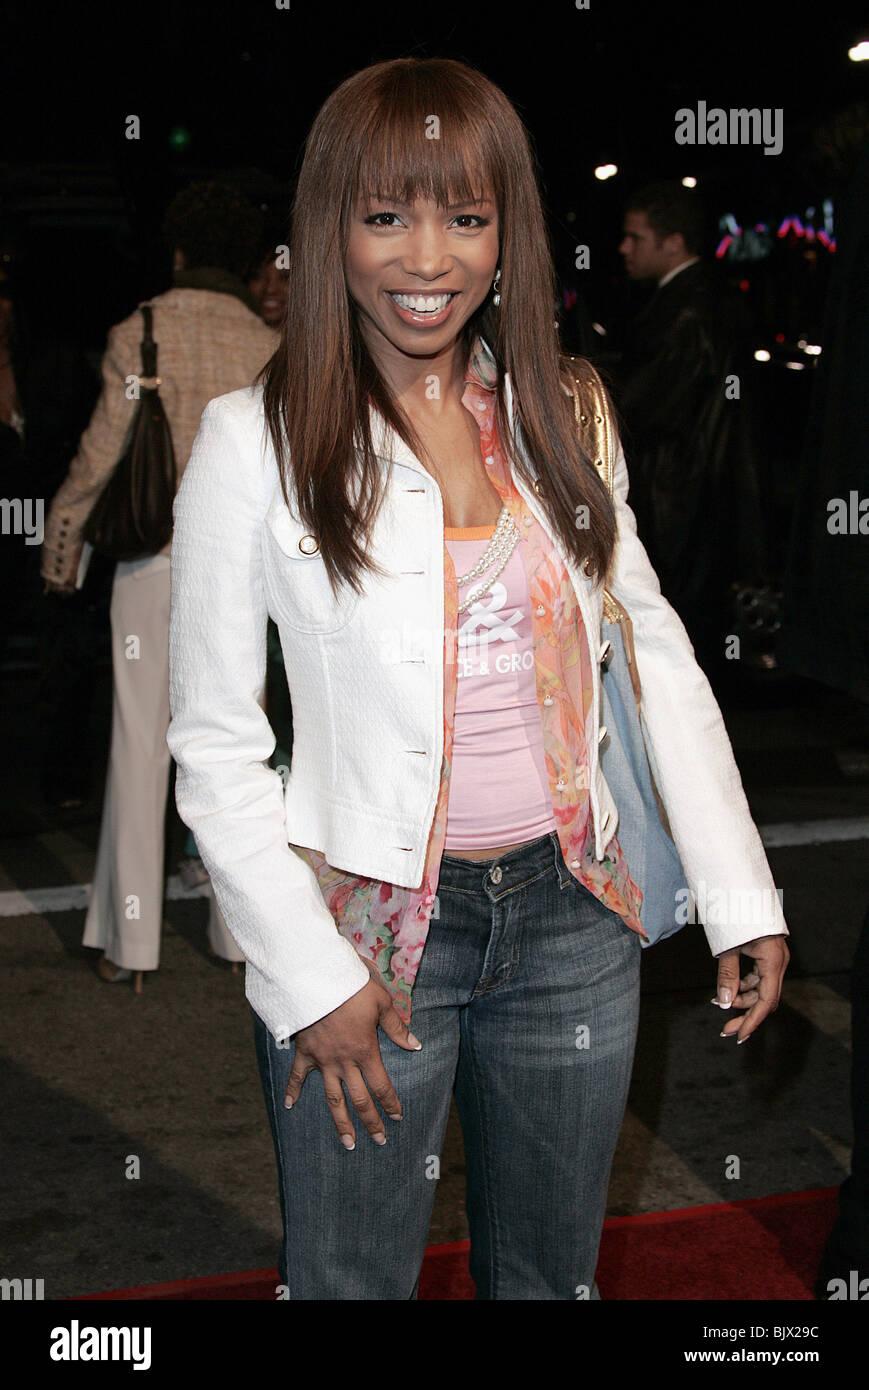 ELISE NEAL BEAUTYSHOP FILM PREMIERE WESTWOOD LA USA 24 March 2005 - Stock Image